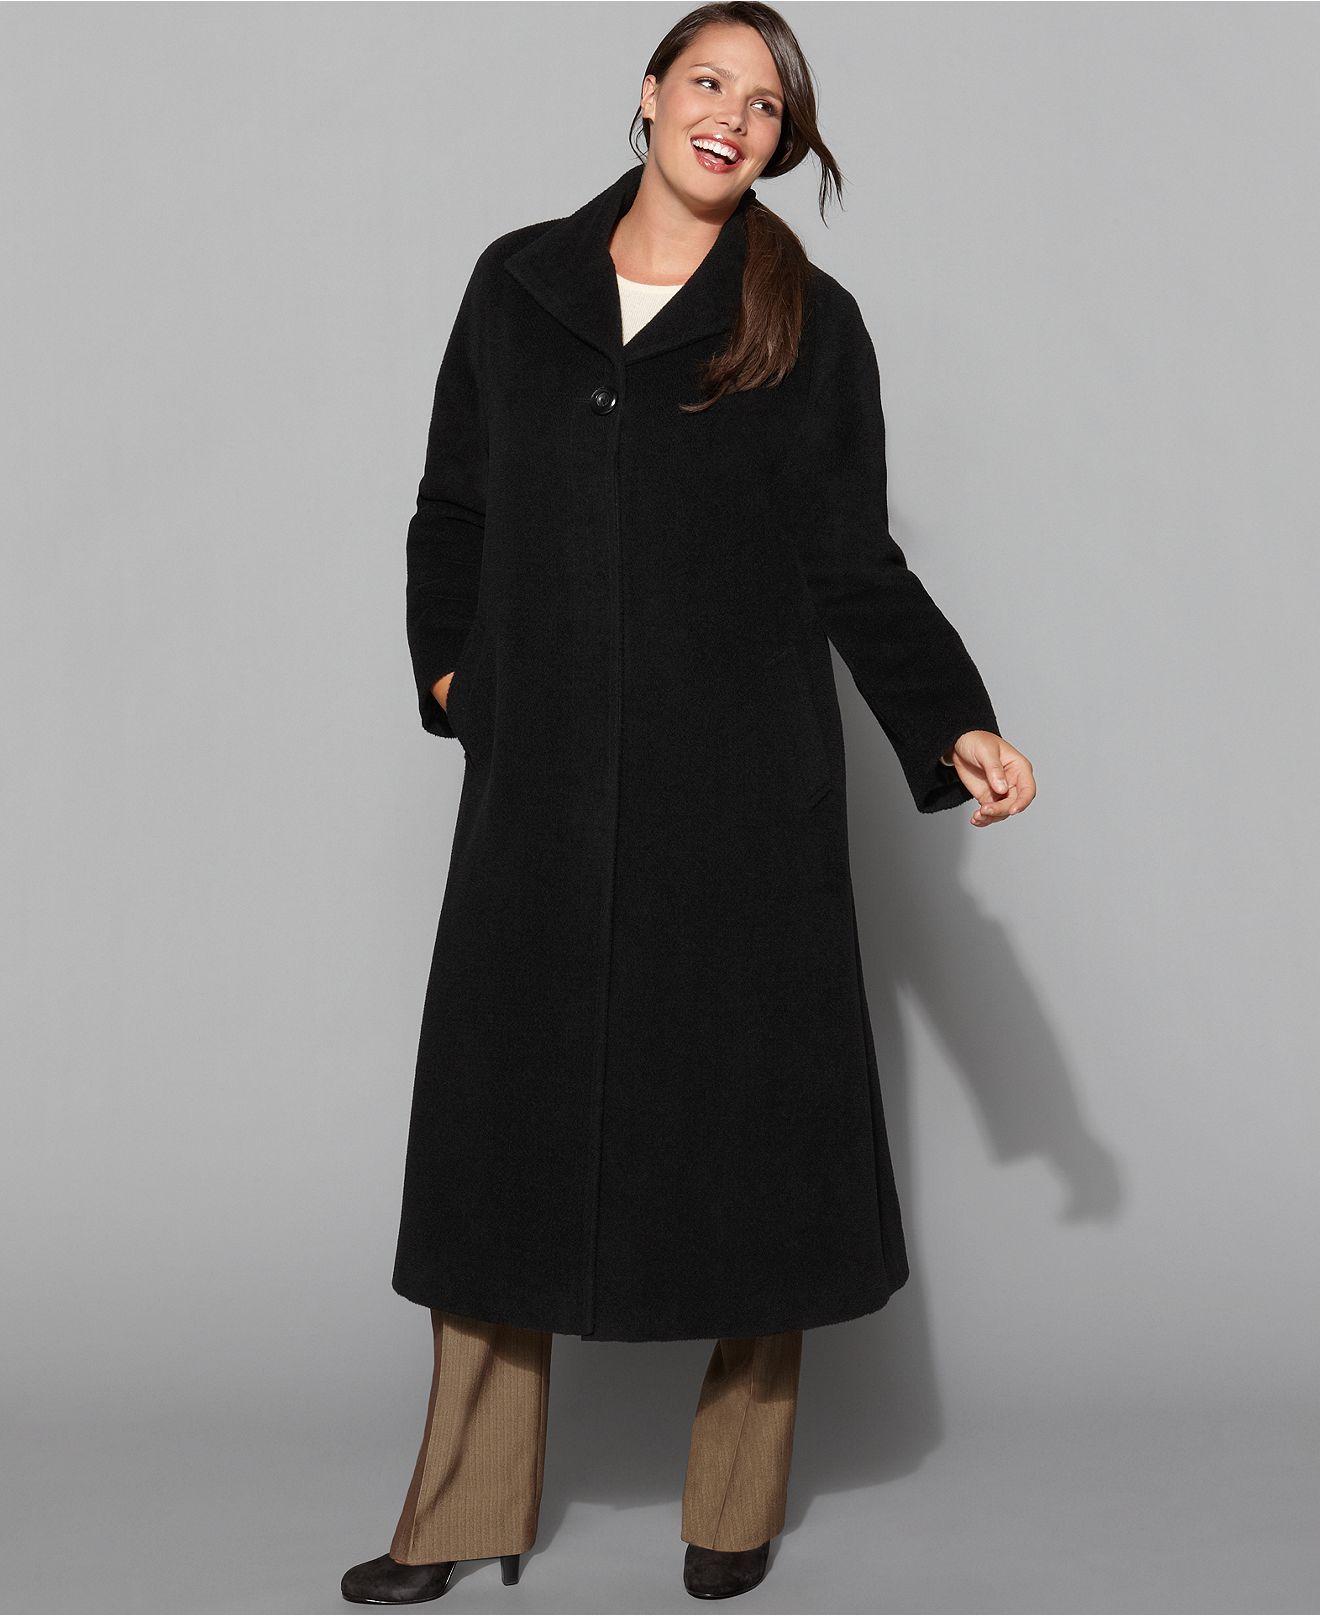 jones new york plus size coat, wool-blend maxi - plus size coats